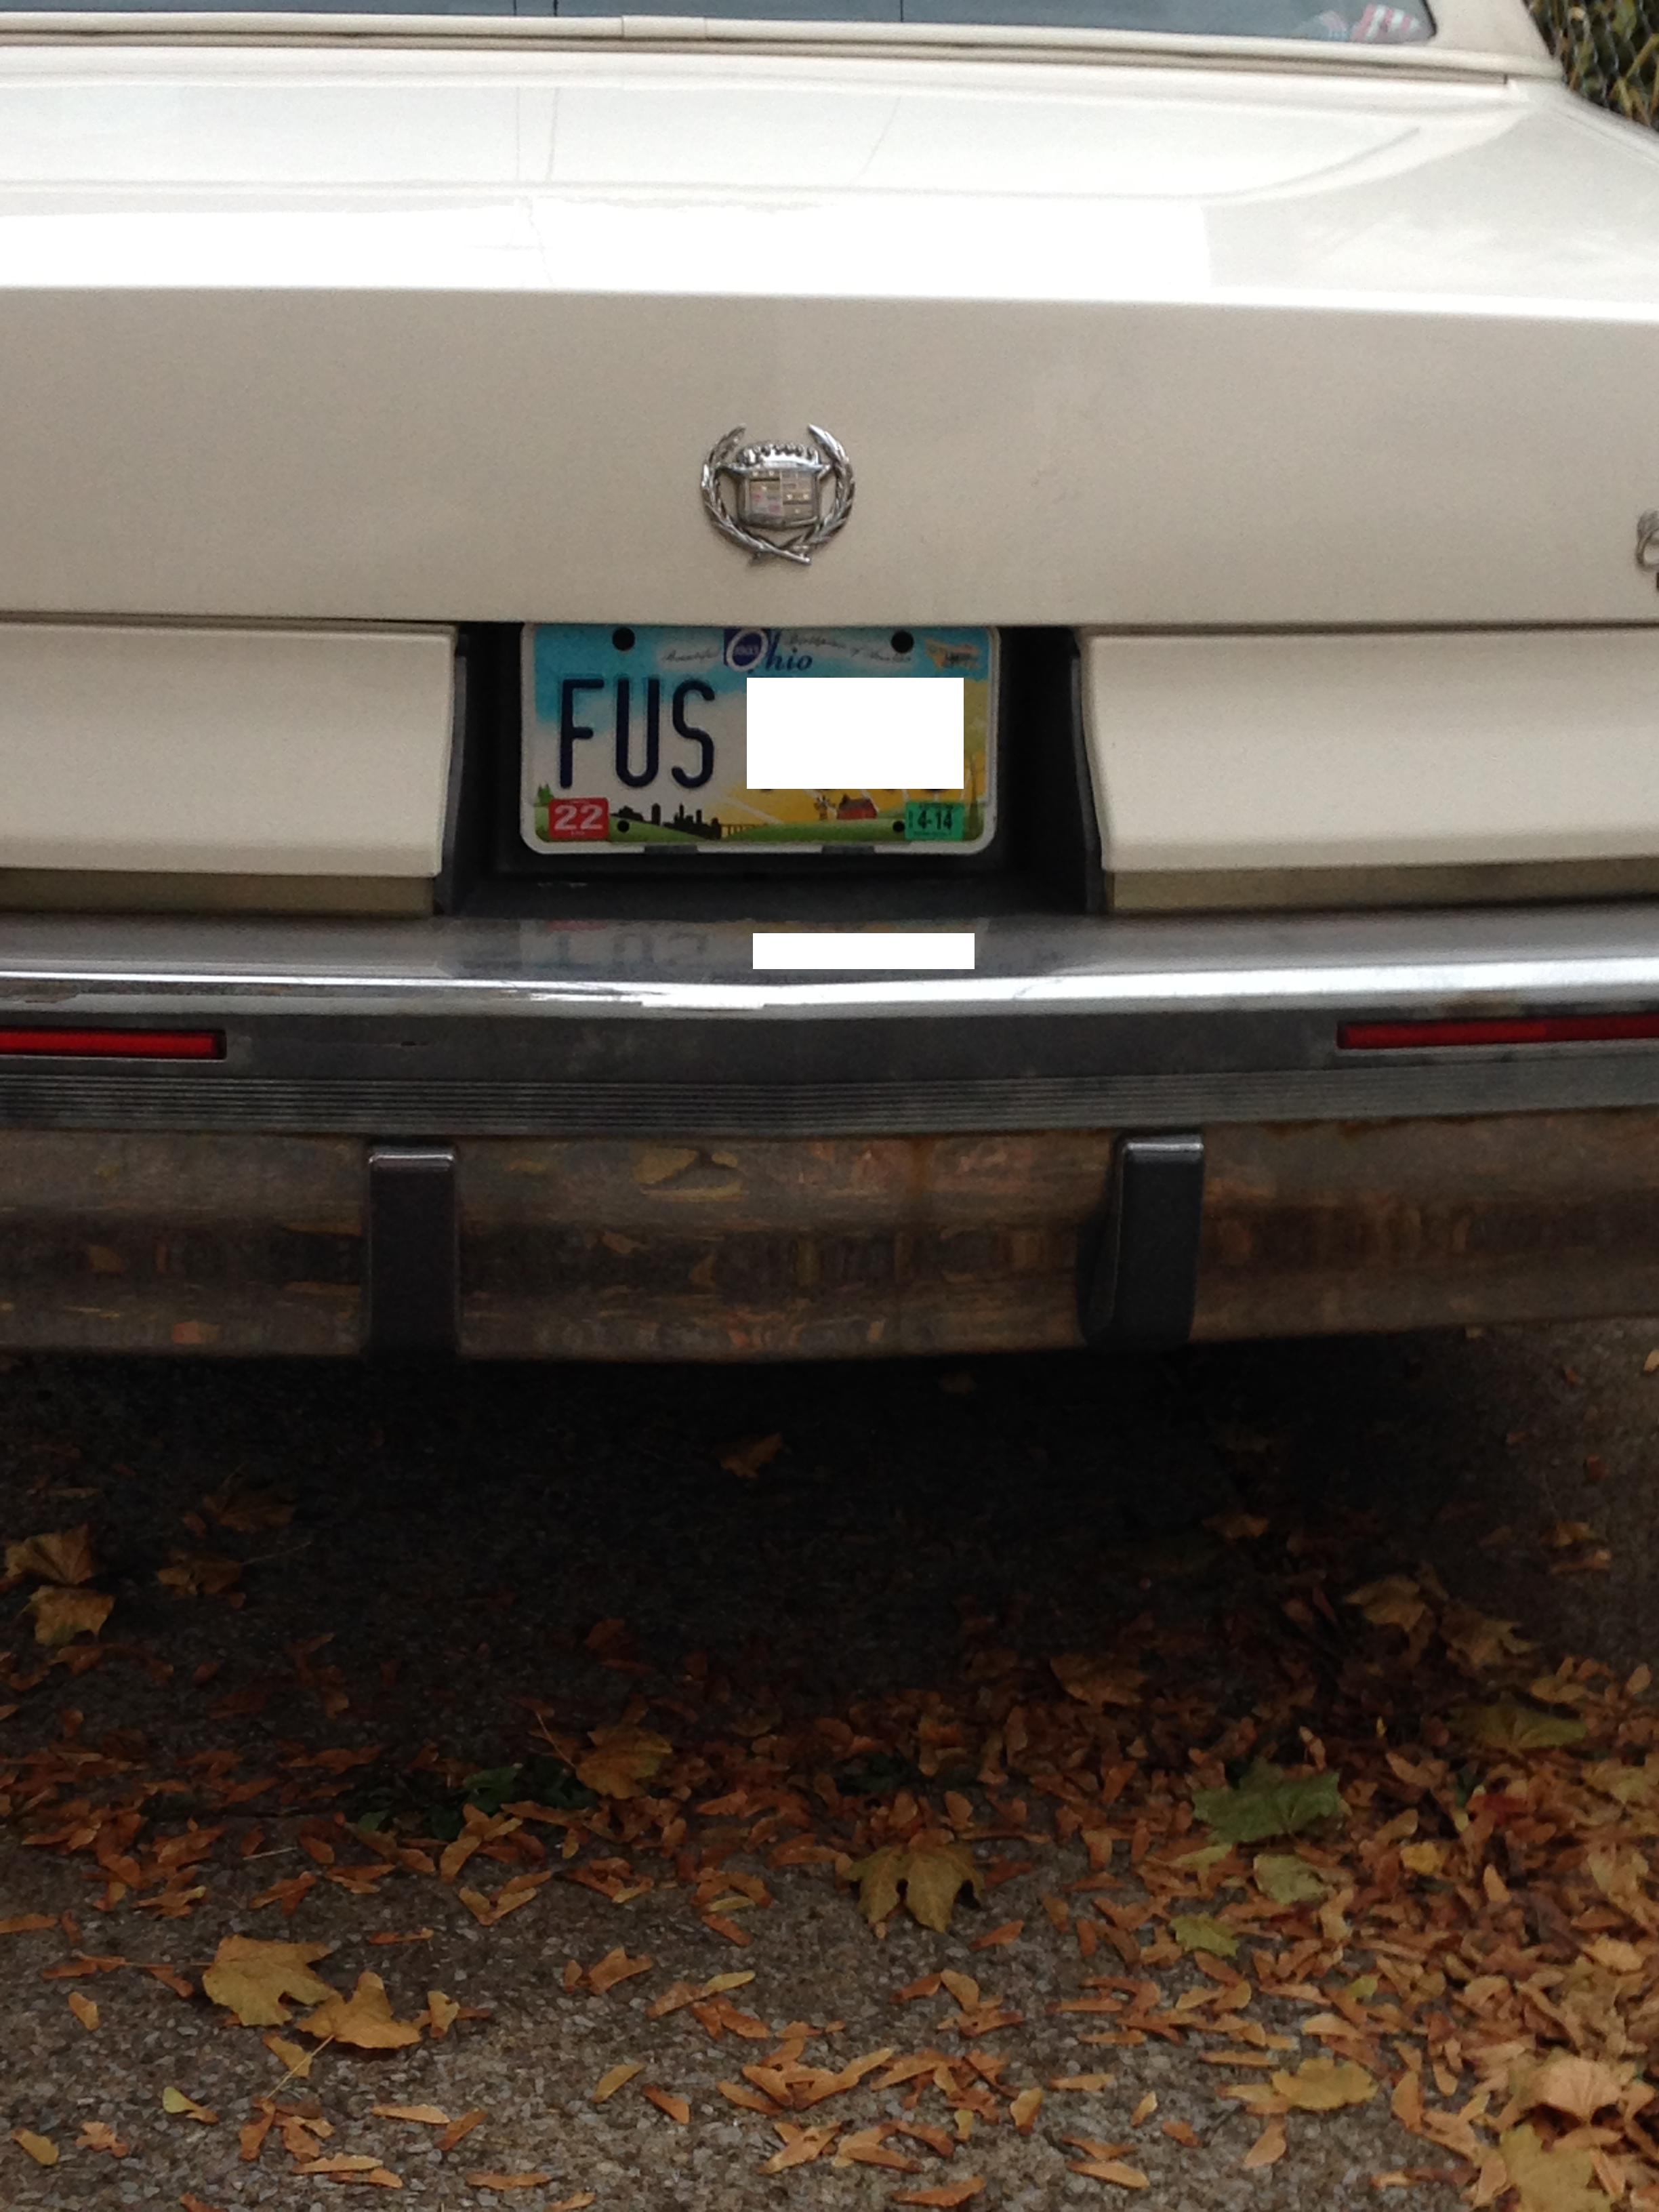 FUS plate